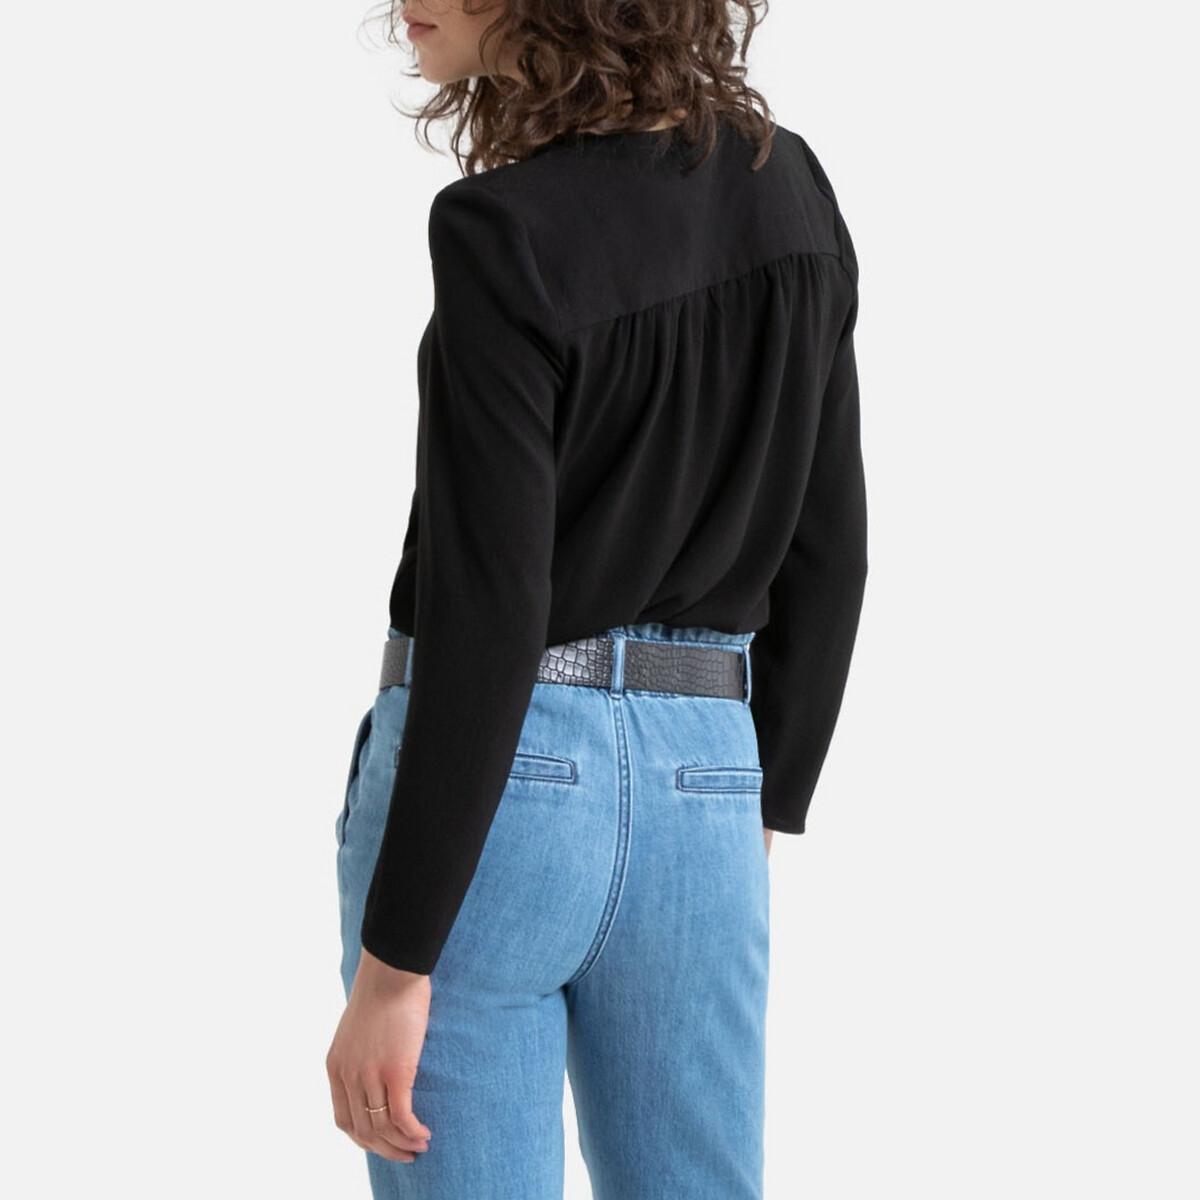 blouse manches 3/4 col V, dentelles